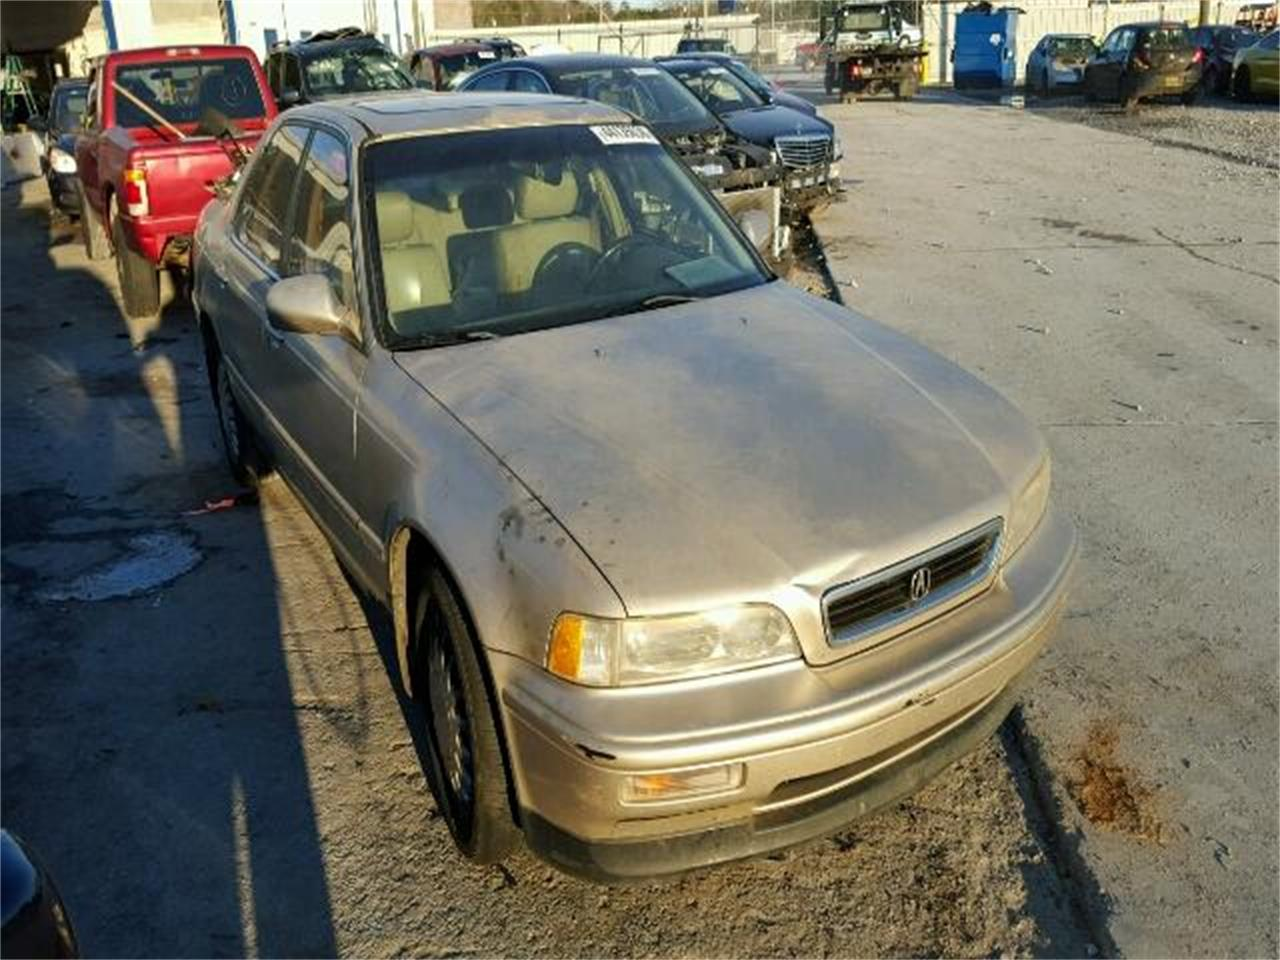 Acura Legend For Sale ClassicCarscom CC - 1993 acura legend for sale